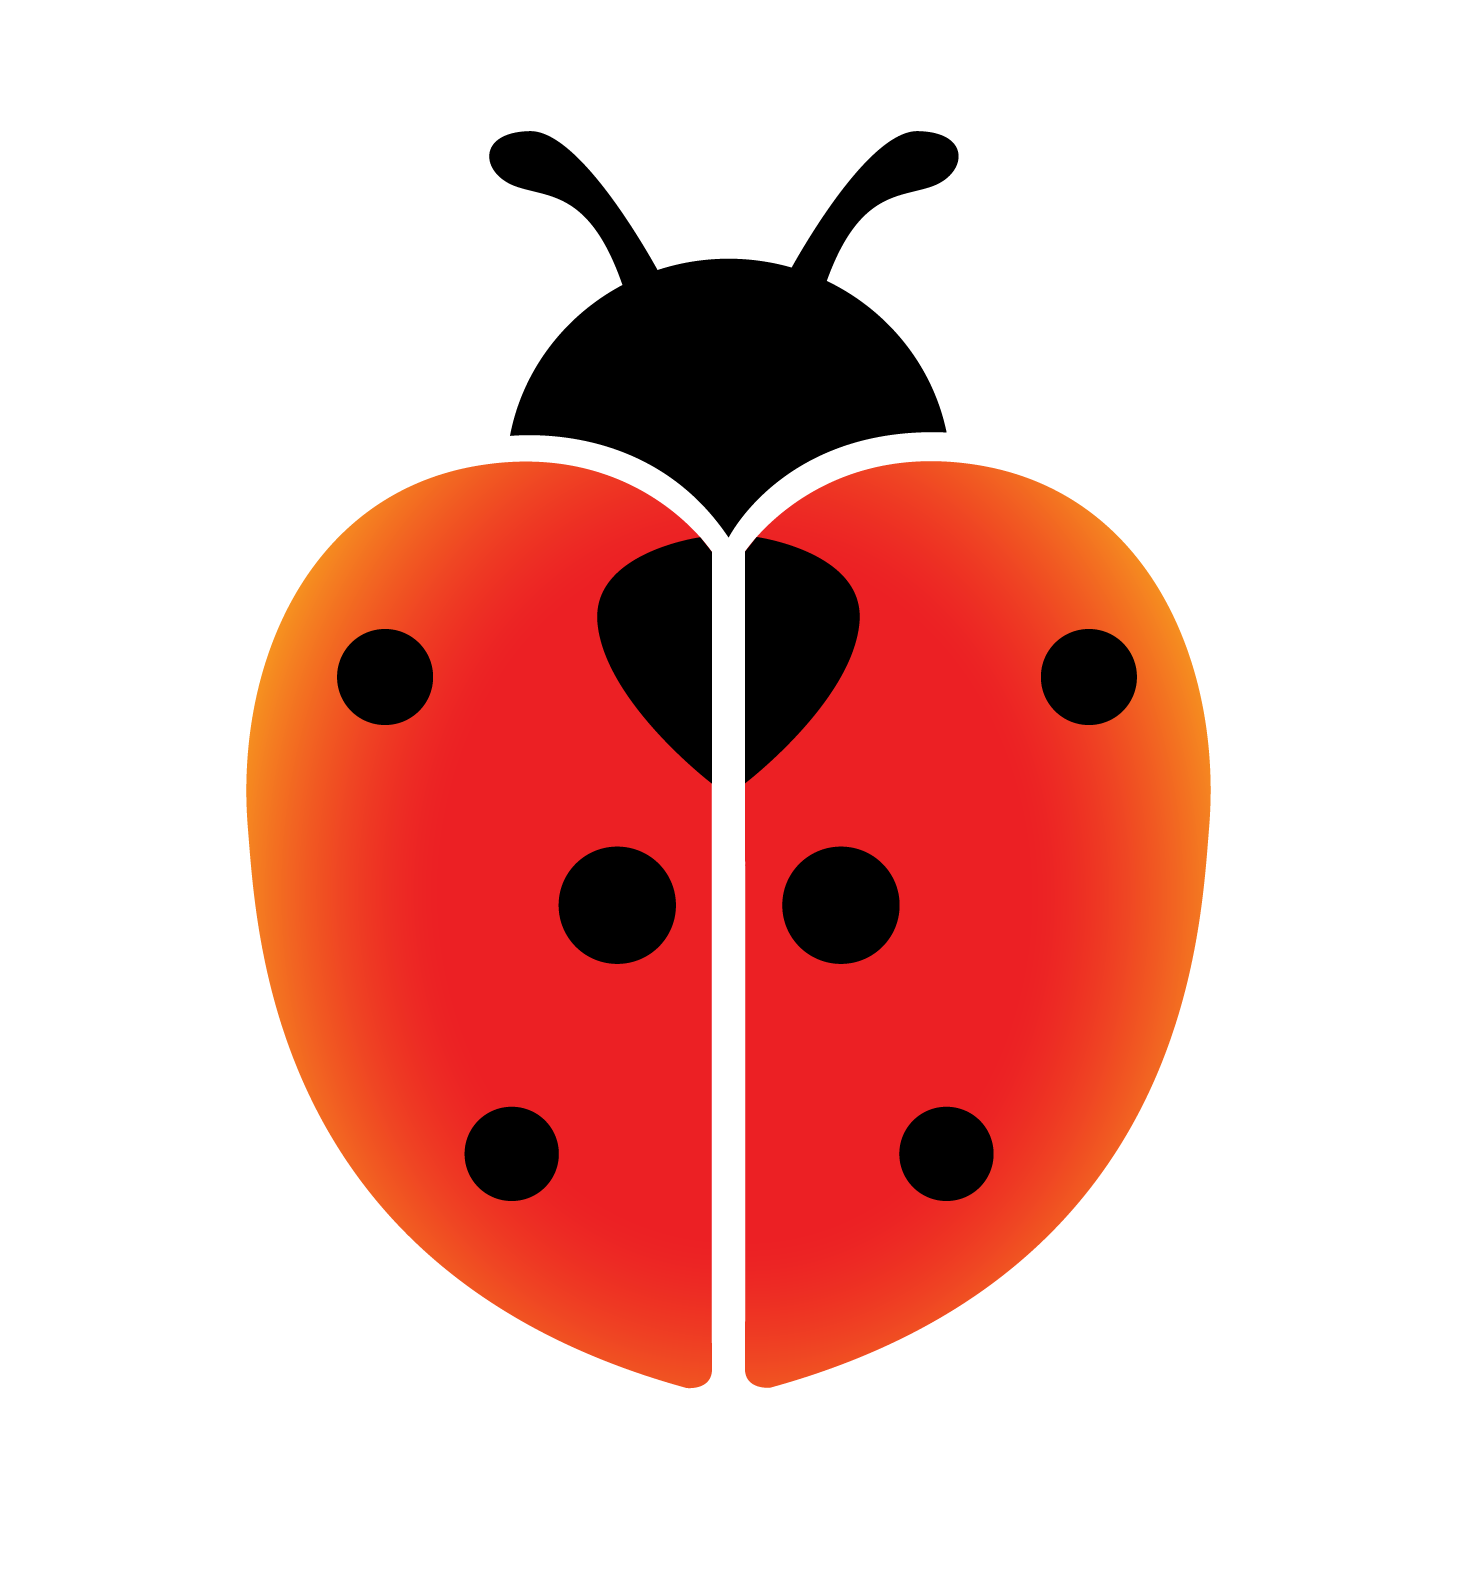 Ladybird First Aid Ltd